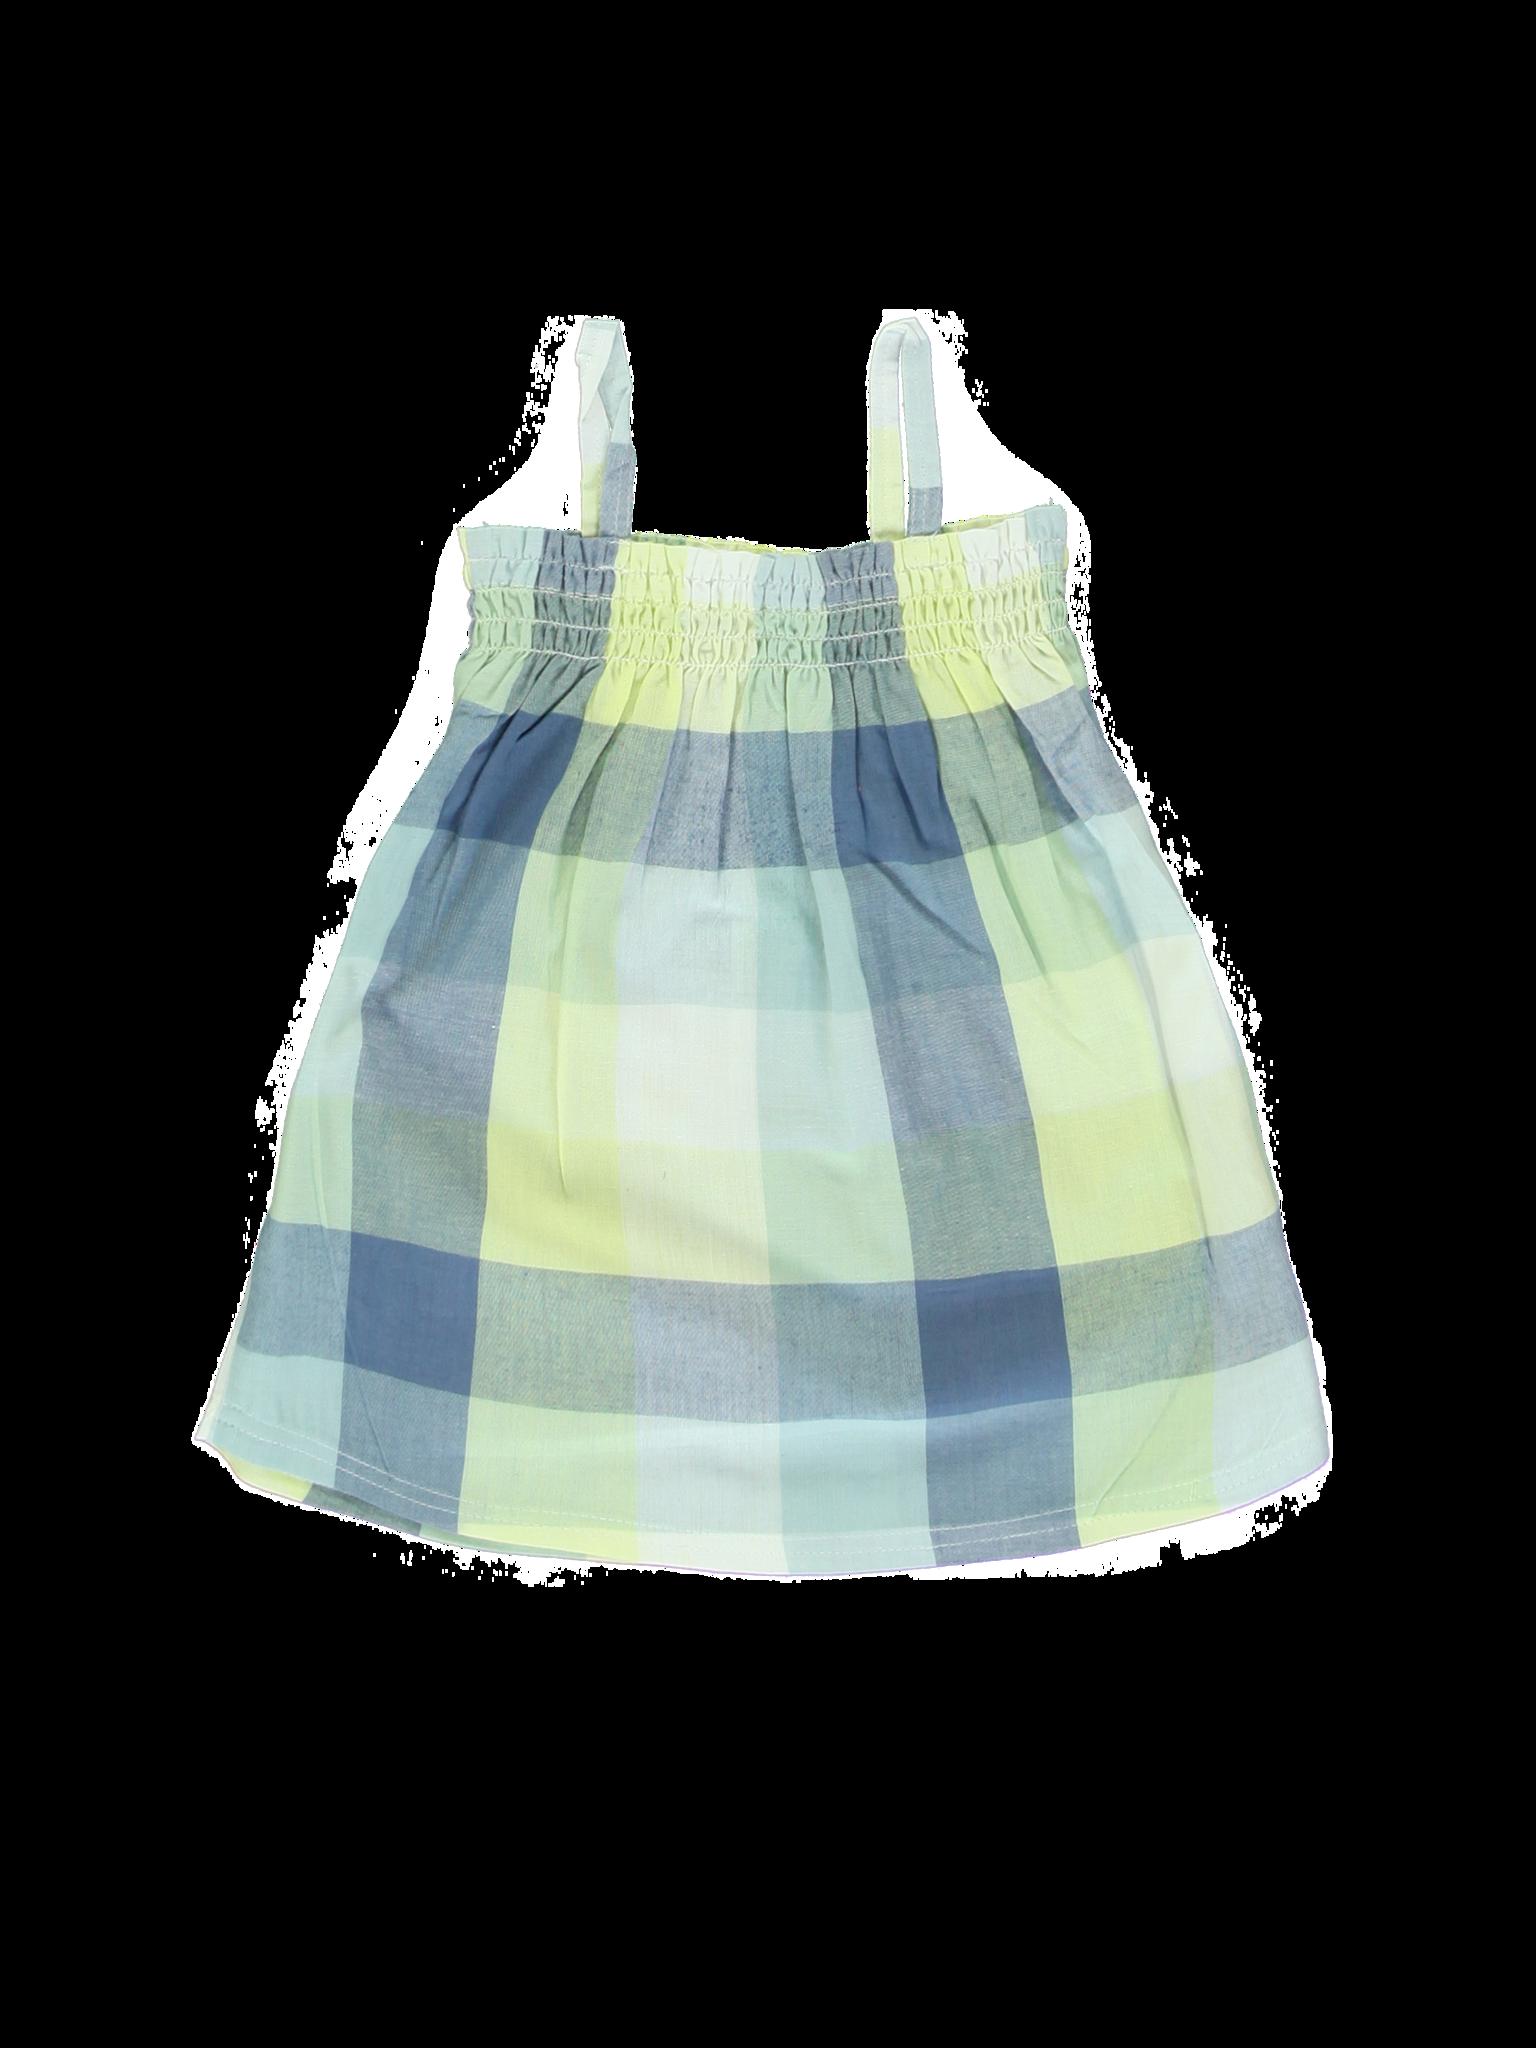 All Brands | Summerproducts Baby | Dress | 16 pcs/box